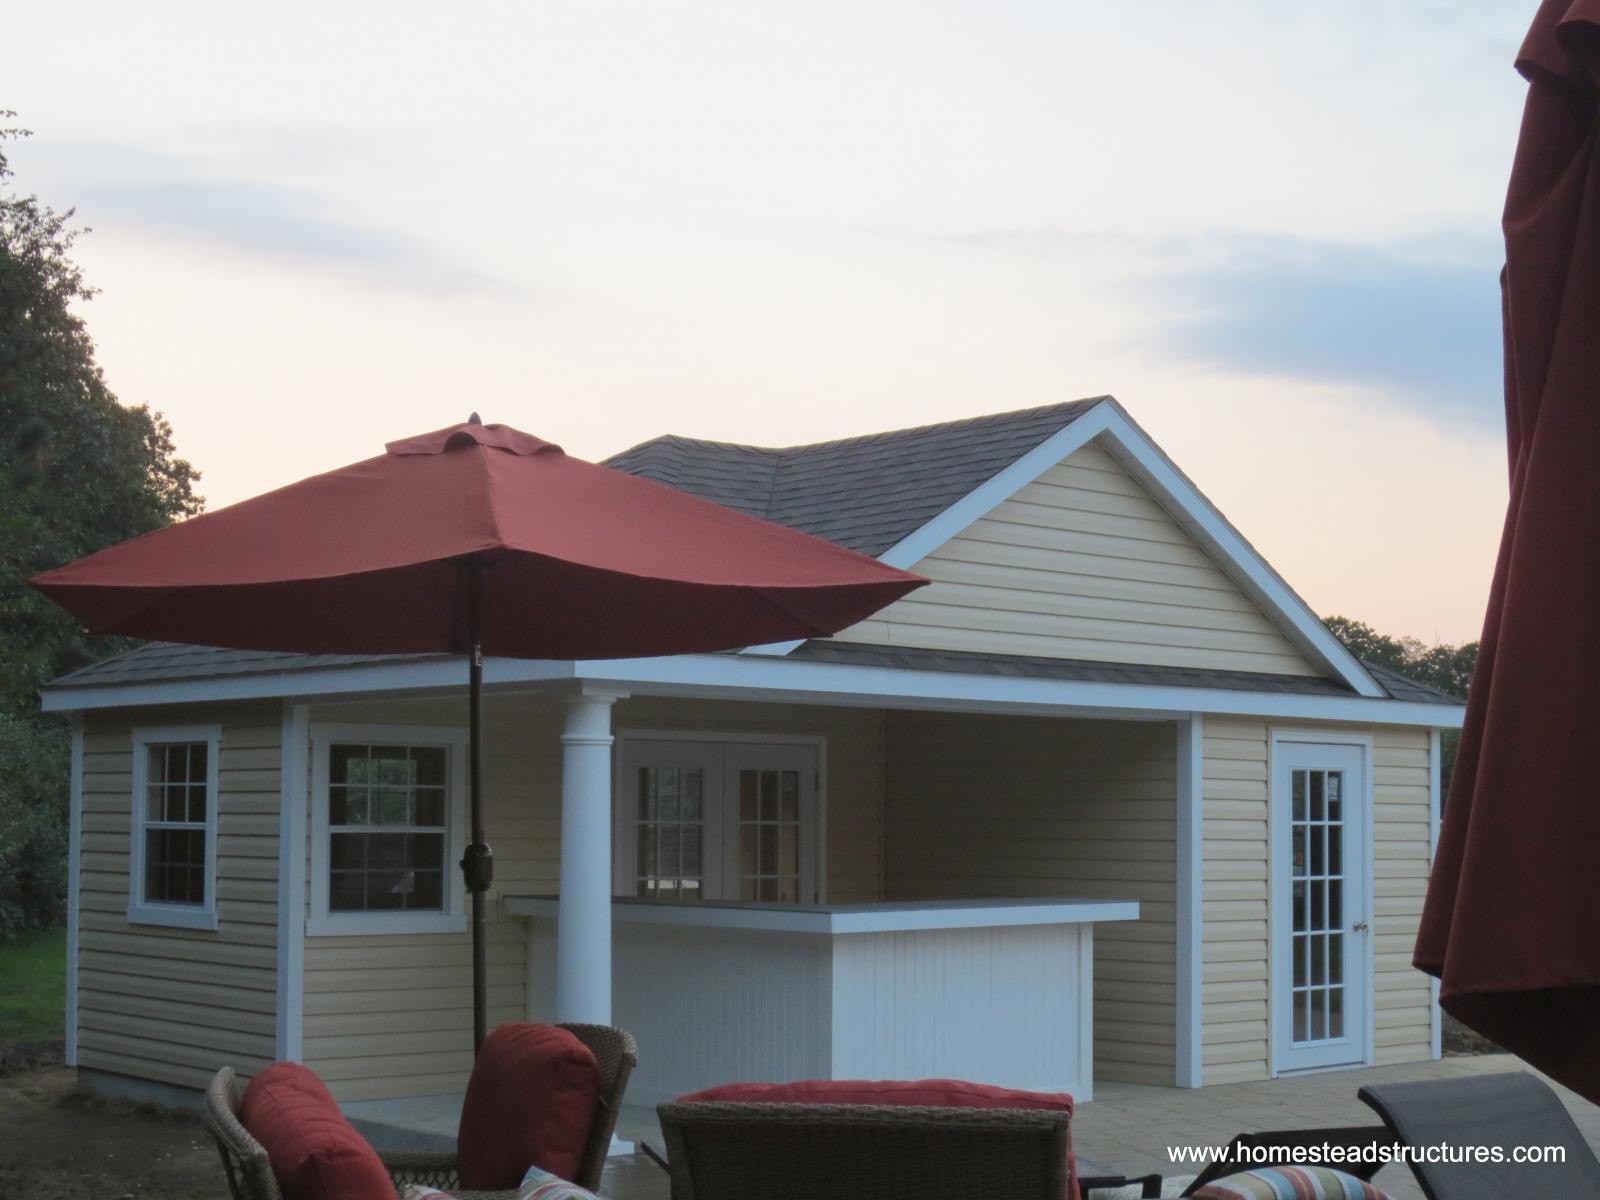 Wellington Pool House Exterior Shots Homestead Structures